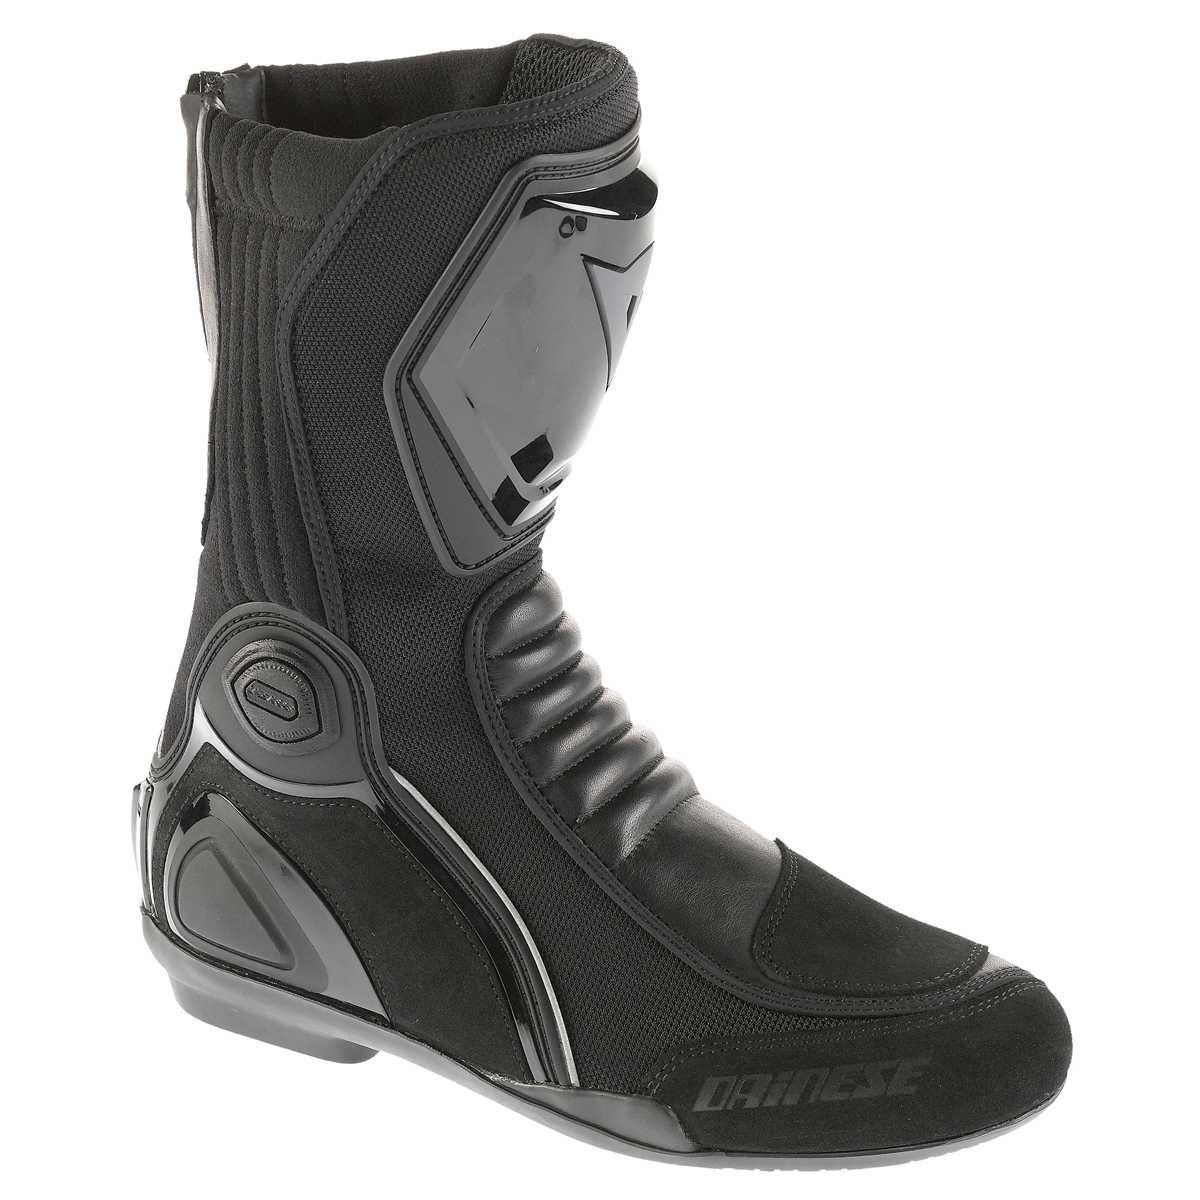 Daytona Spirit GTX Stivali in Pelle da motociclista da uomo/ /Nero